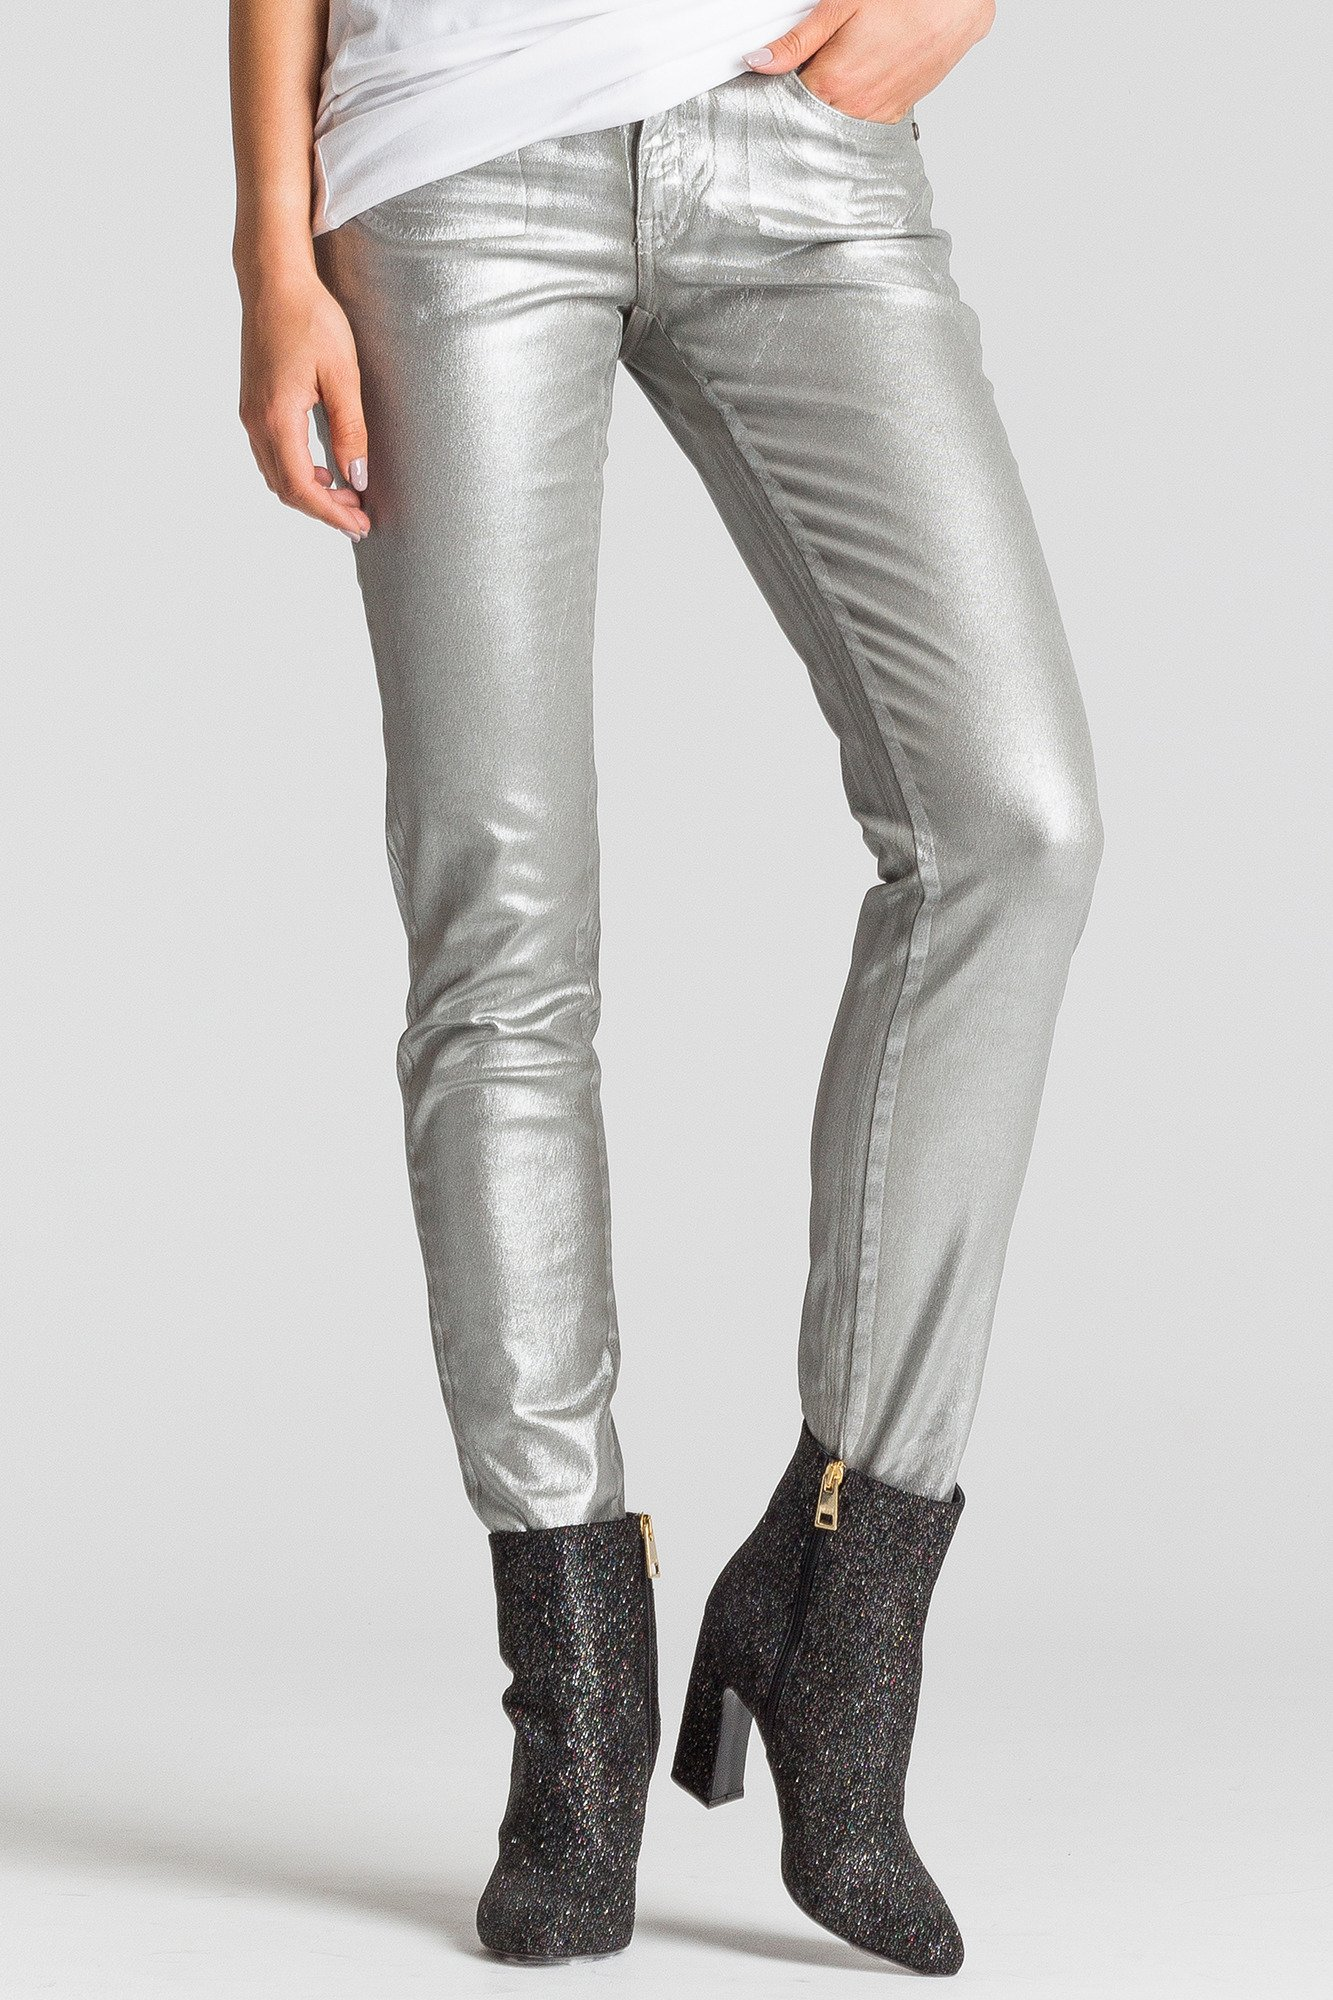 fbd544654e25 ... Srebrne jeansy damskie z połyskiem ...